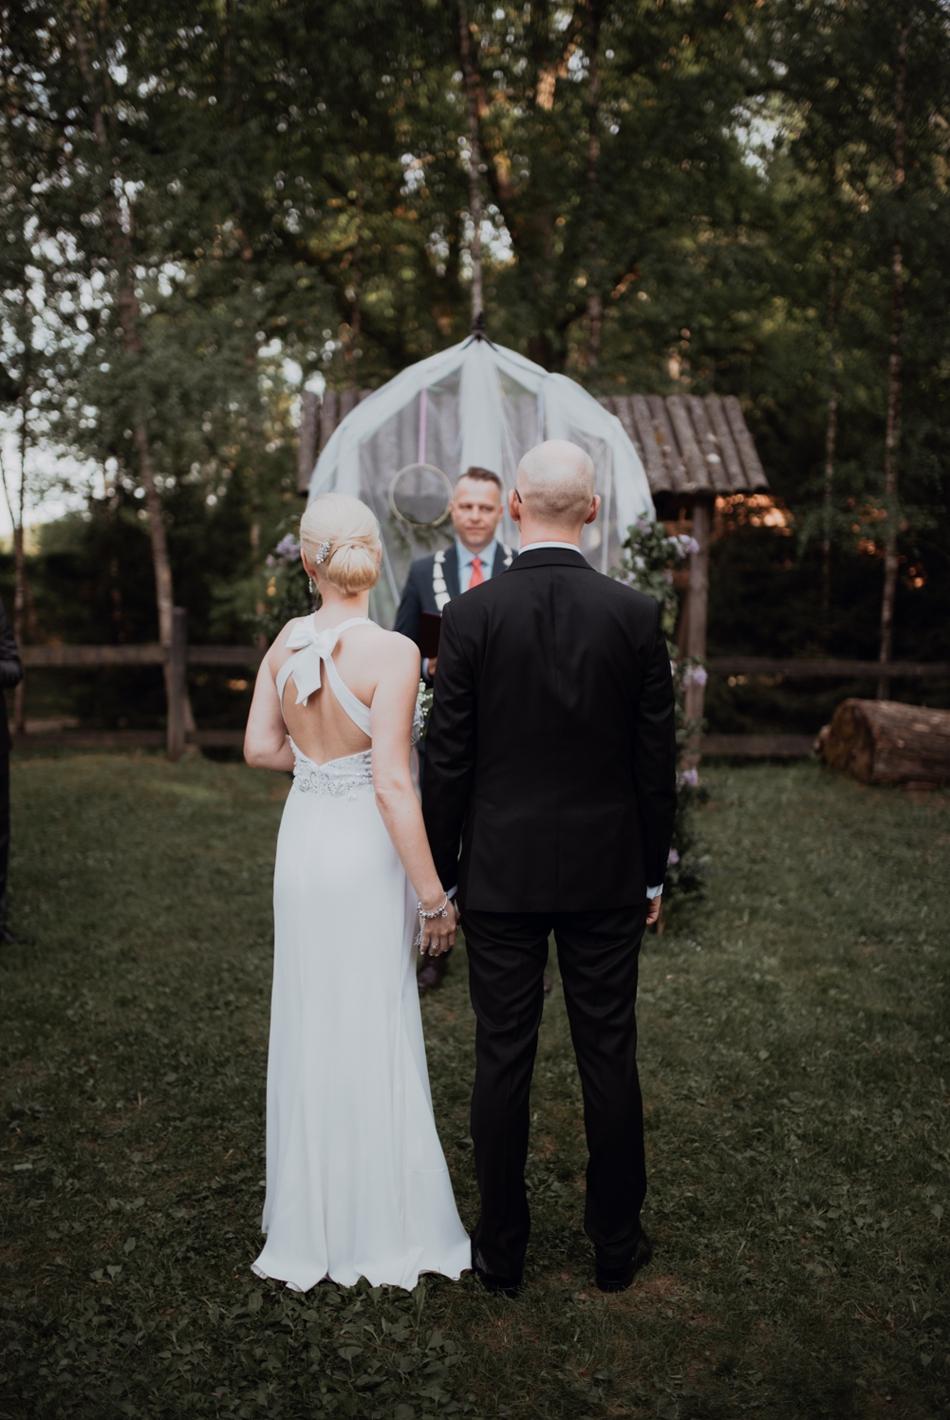 wedding-photographer-zukography-destination62.jpg